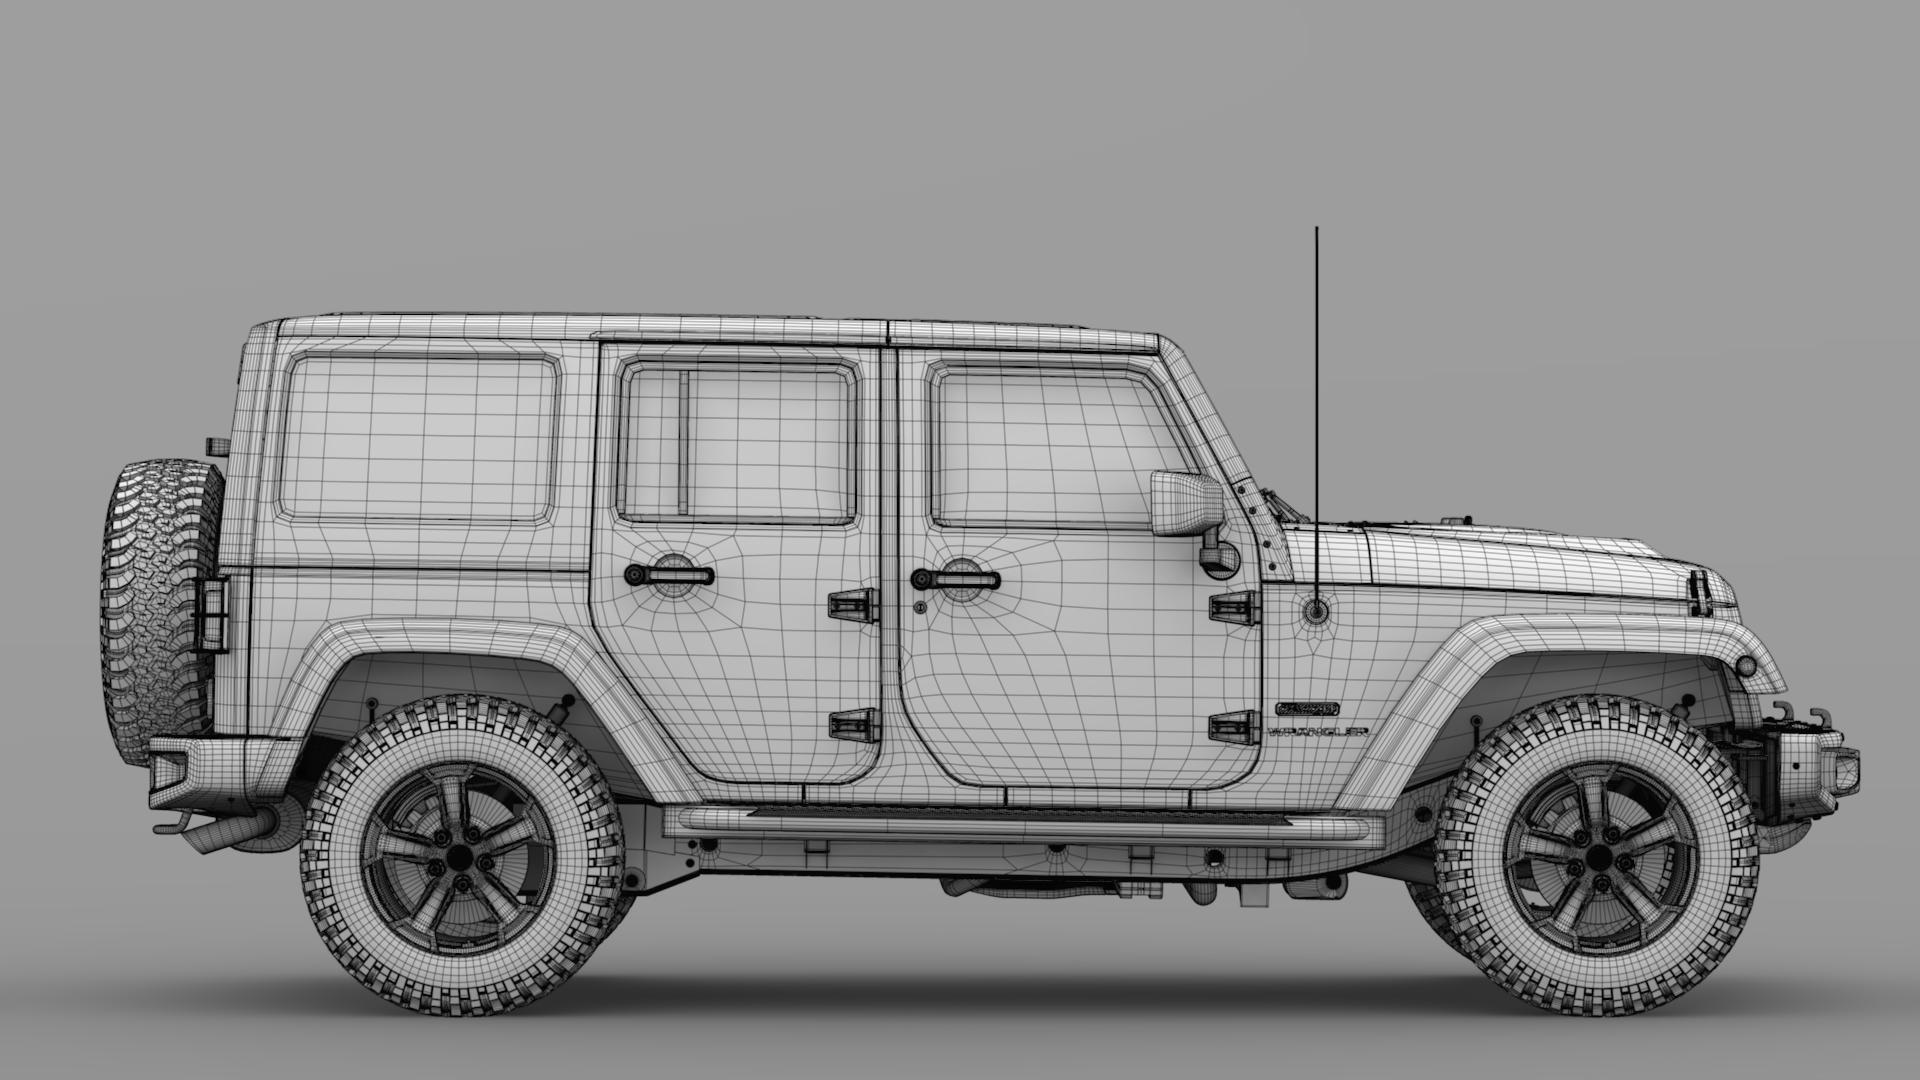 jeep wrangler unlimited rubicon recon jk 2017 3d model max fbx c4d lwo ma mb hrc xsi obj 277011